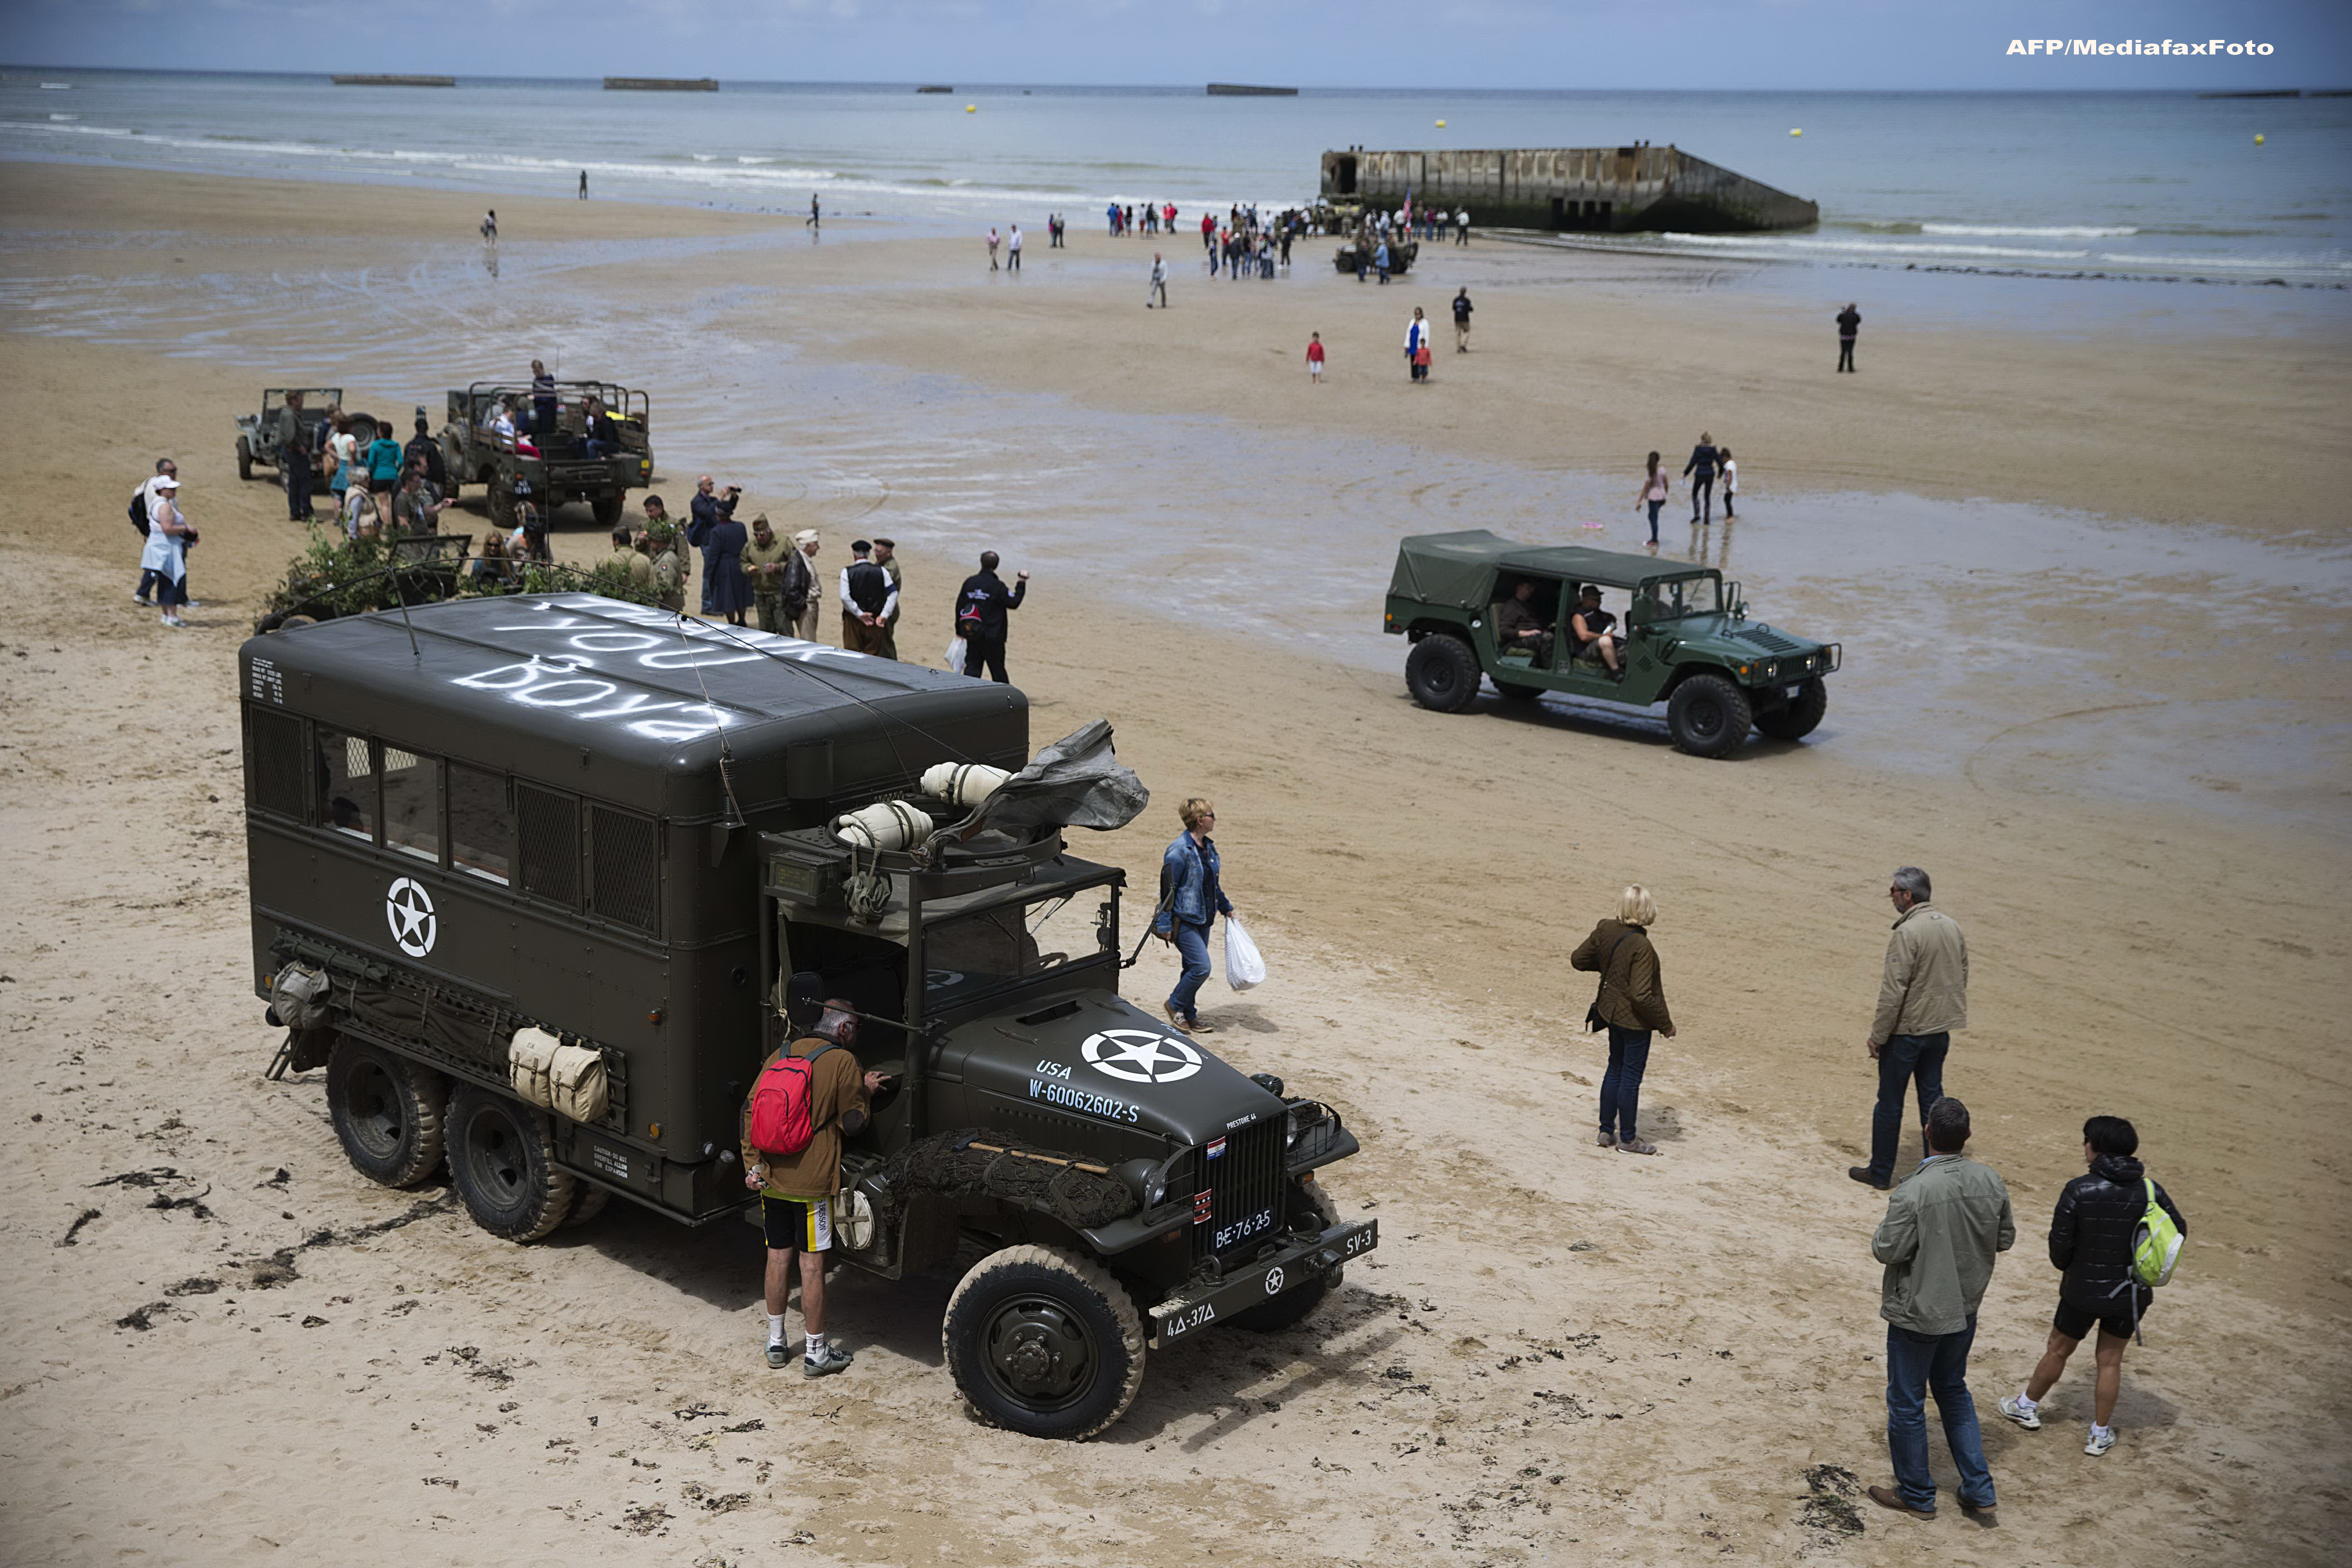 Europa comemoreaza 70 de ani de la debarcarea din Normandia. 20 de sefi de stat si de guvern participa la ceremonii